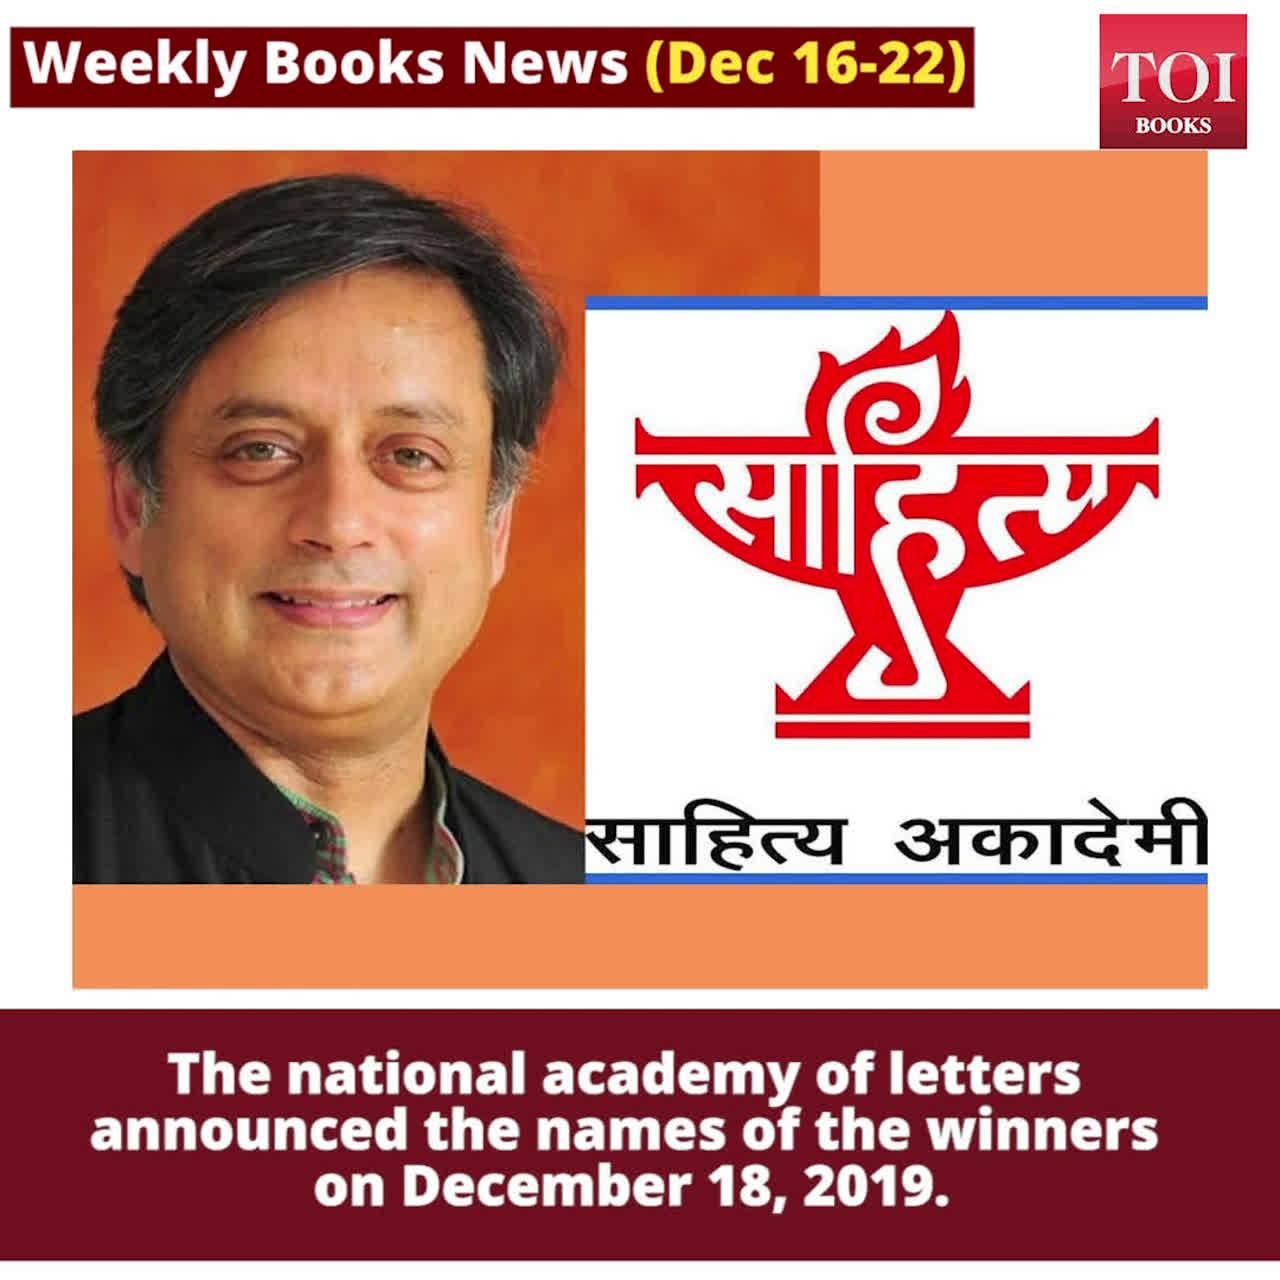 weekly-books-news-dec-16-22